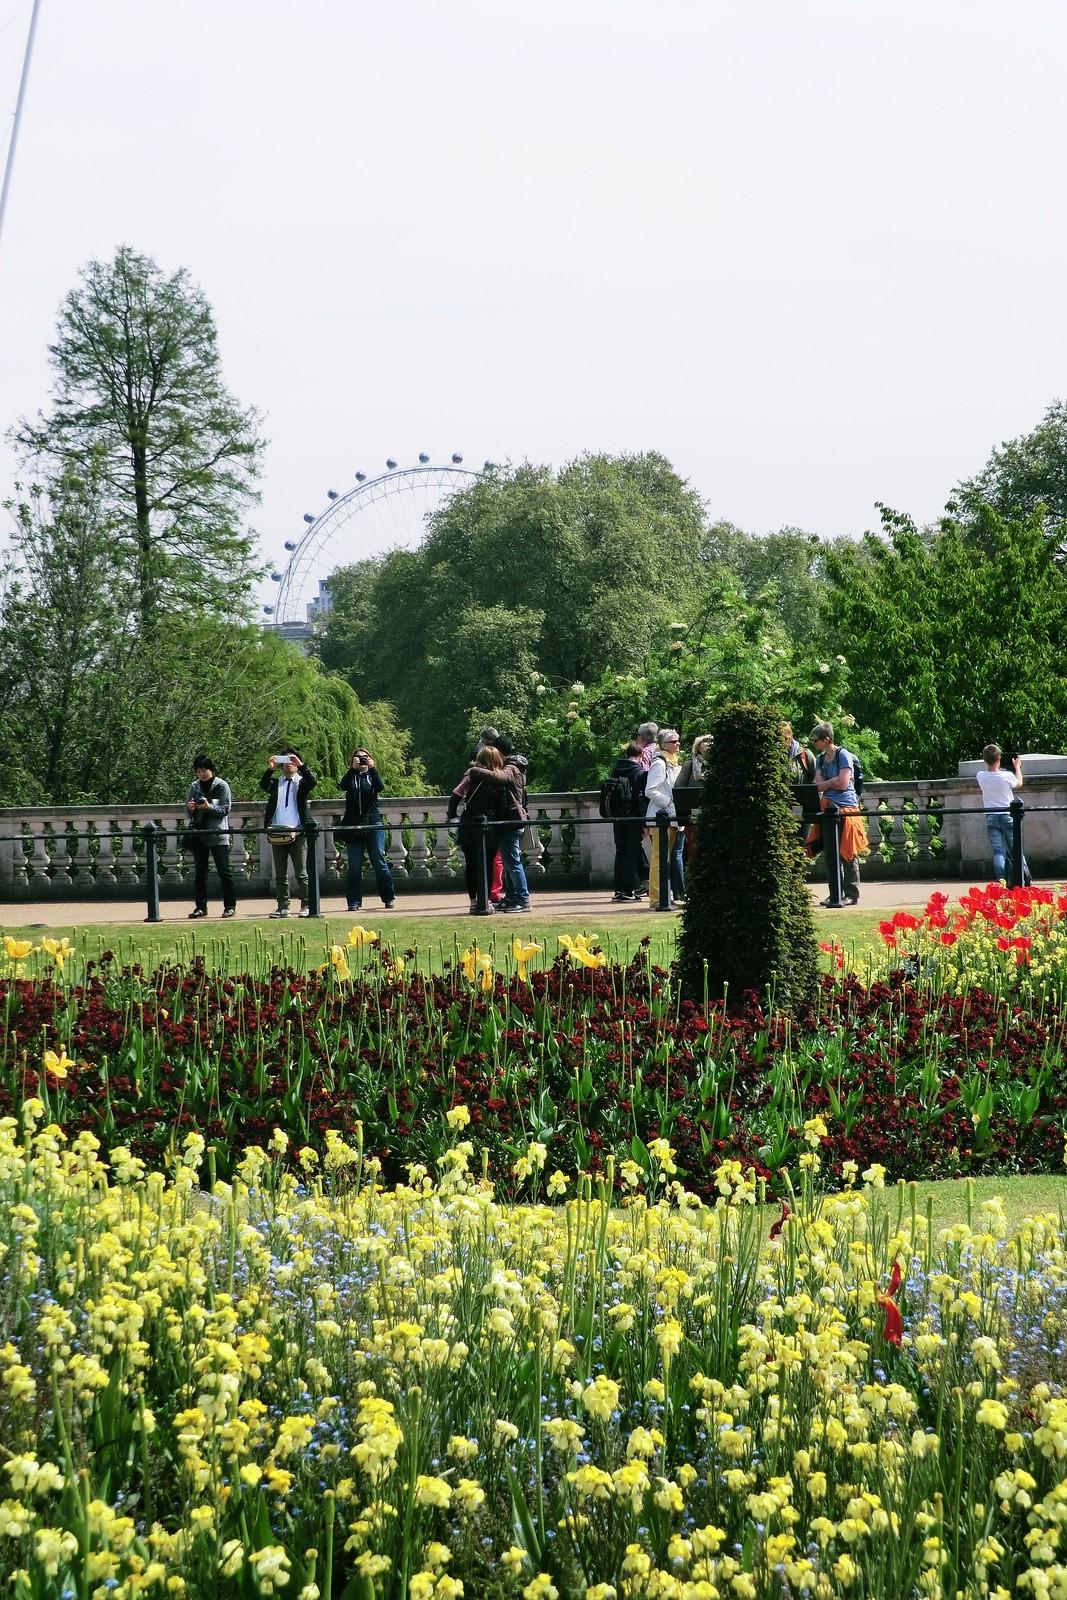 Glimpse of London Eye from Buckingham Palace